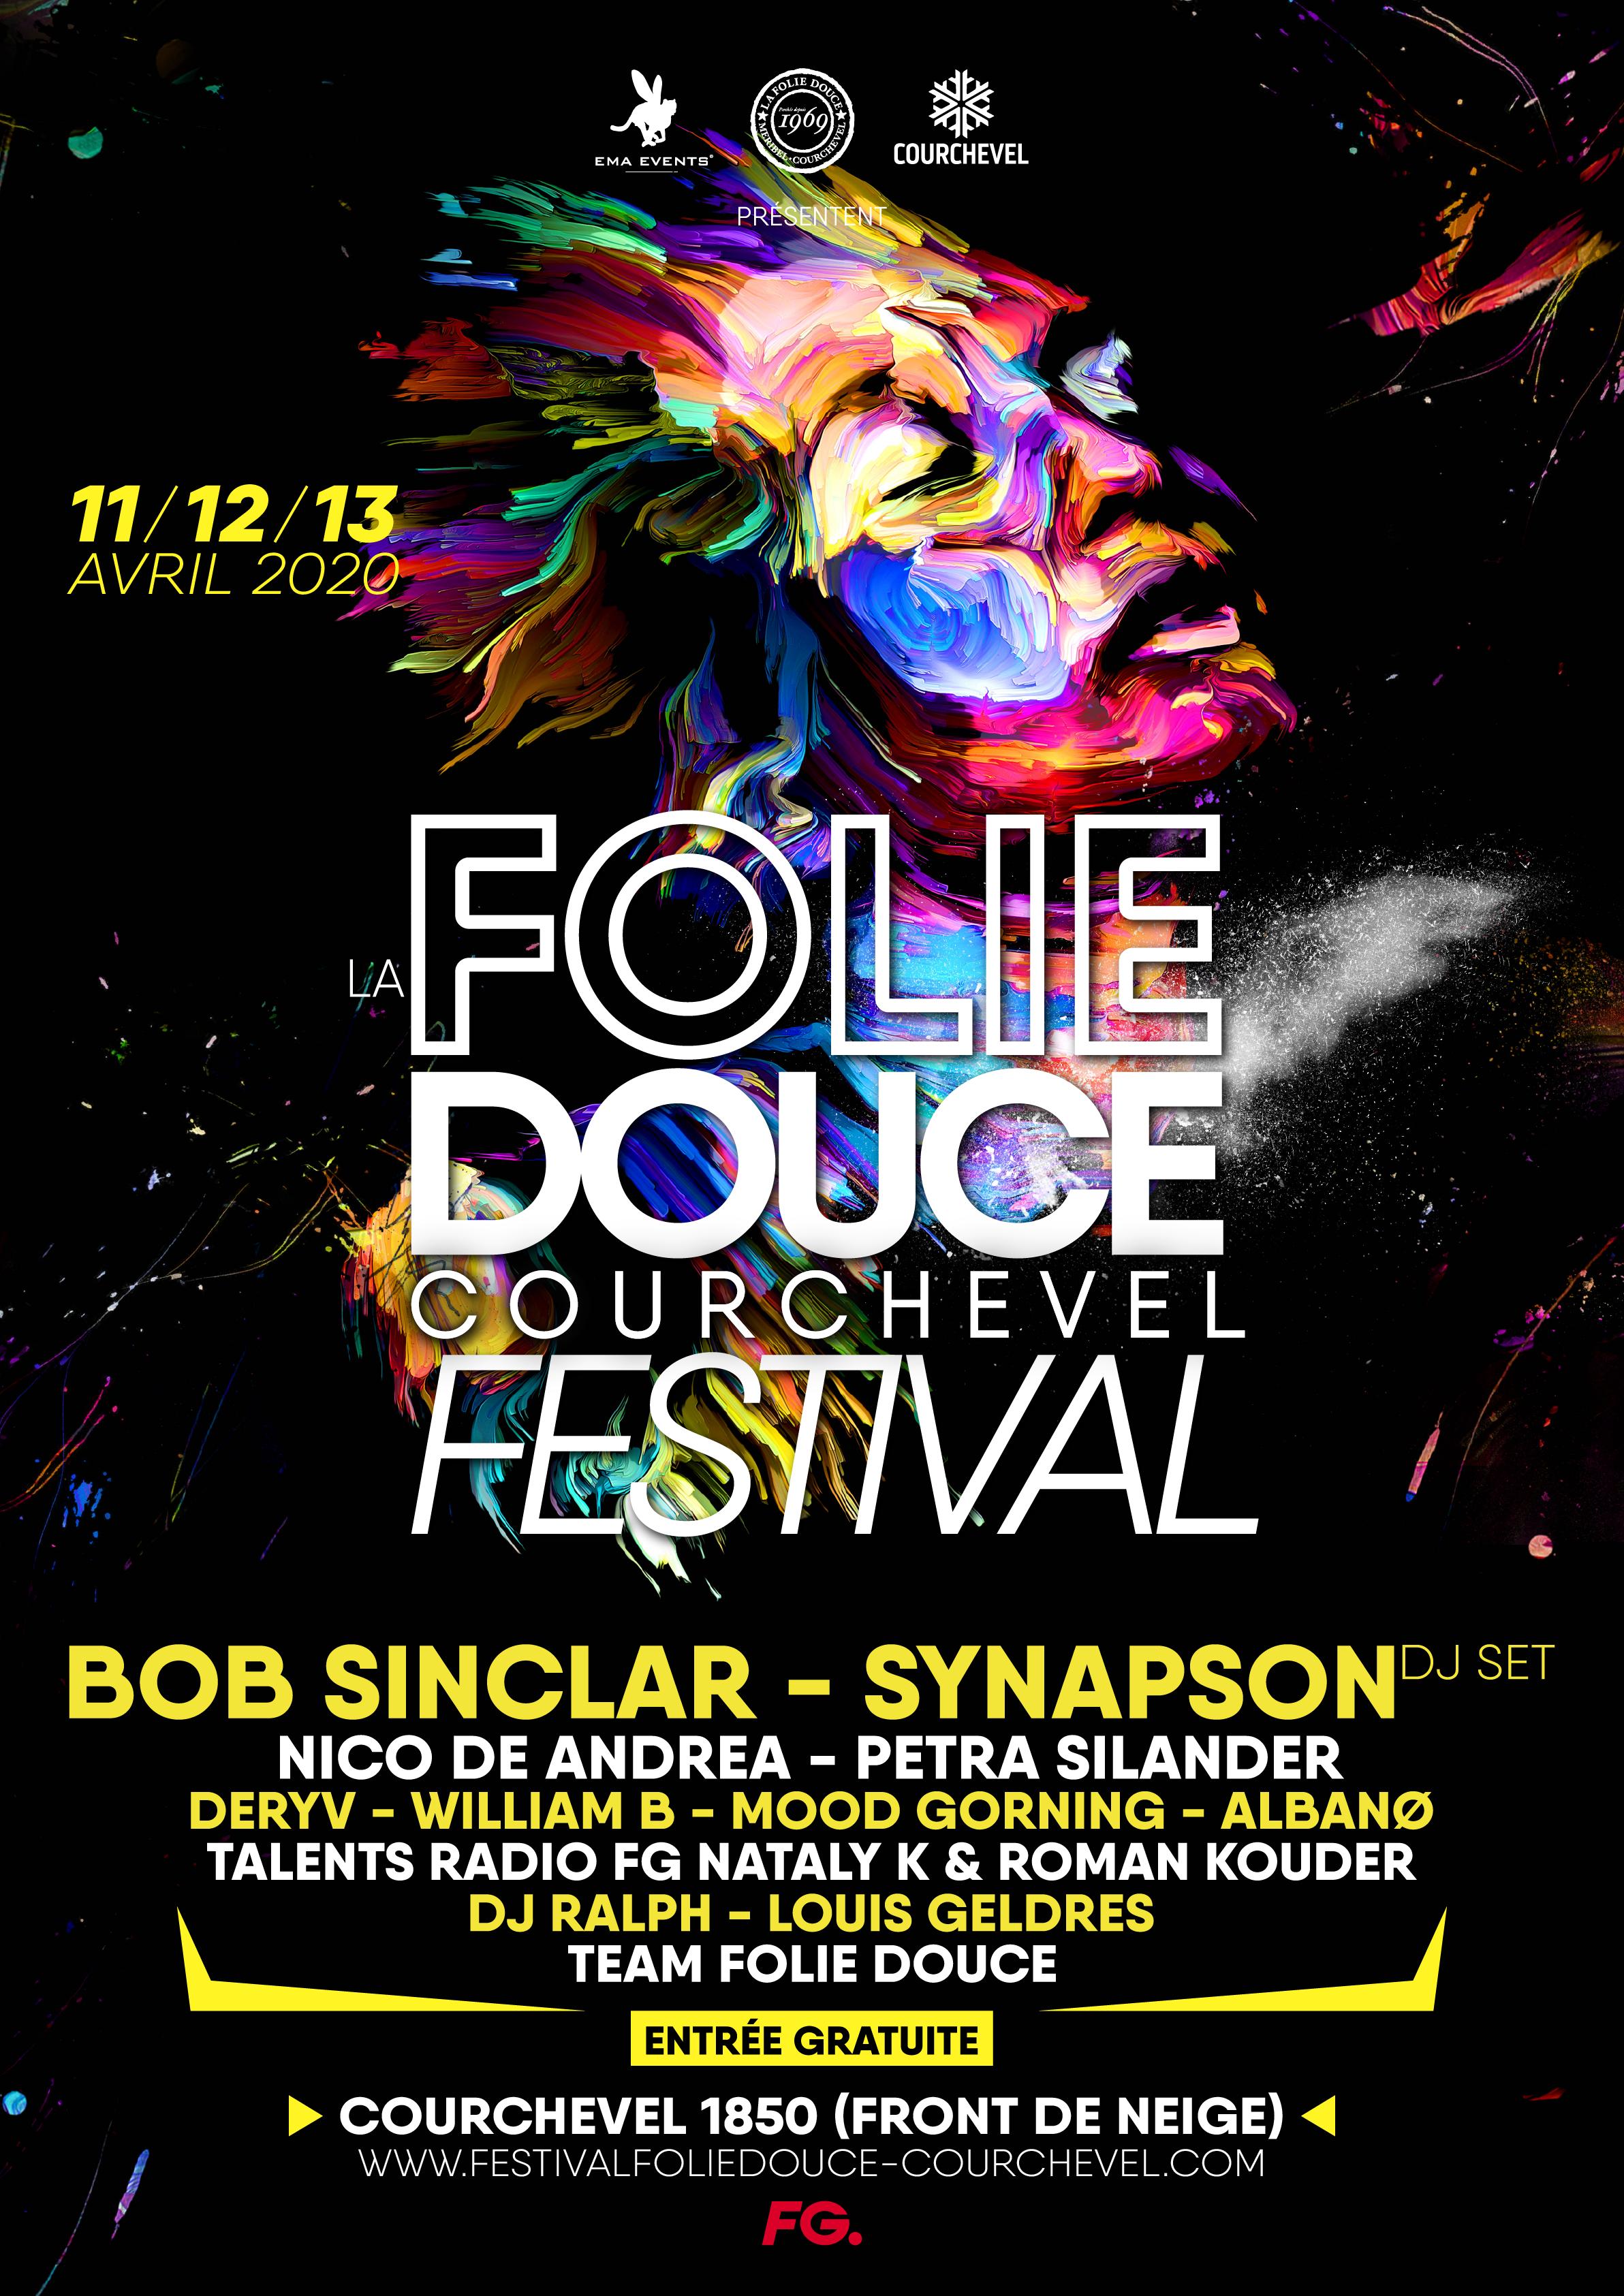 Festival Folie Douce